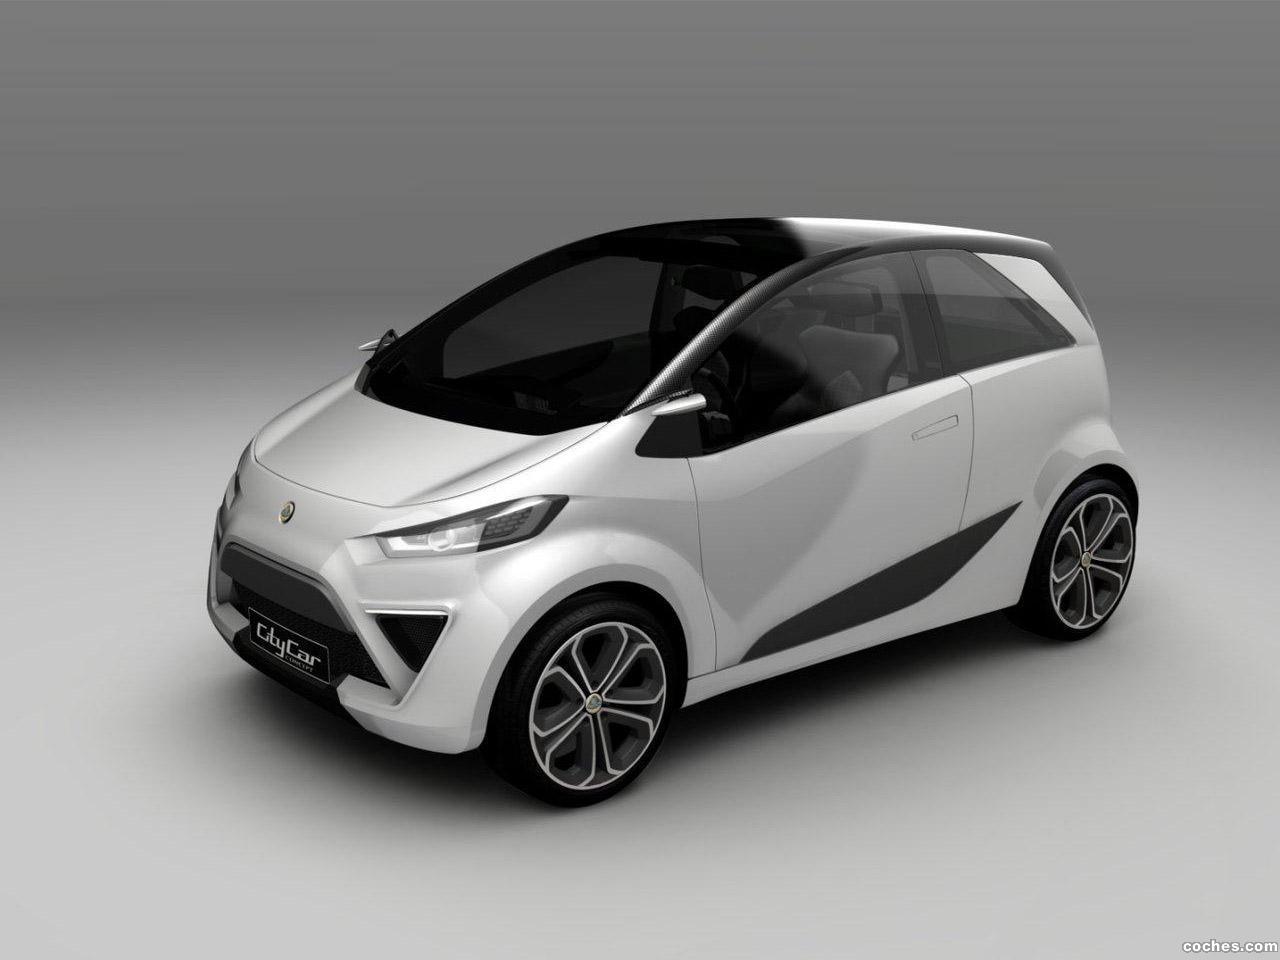 Foto 0 de Lotus City Car Concept 2010